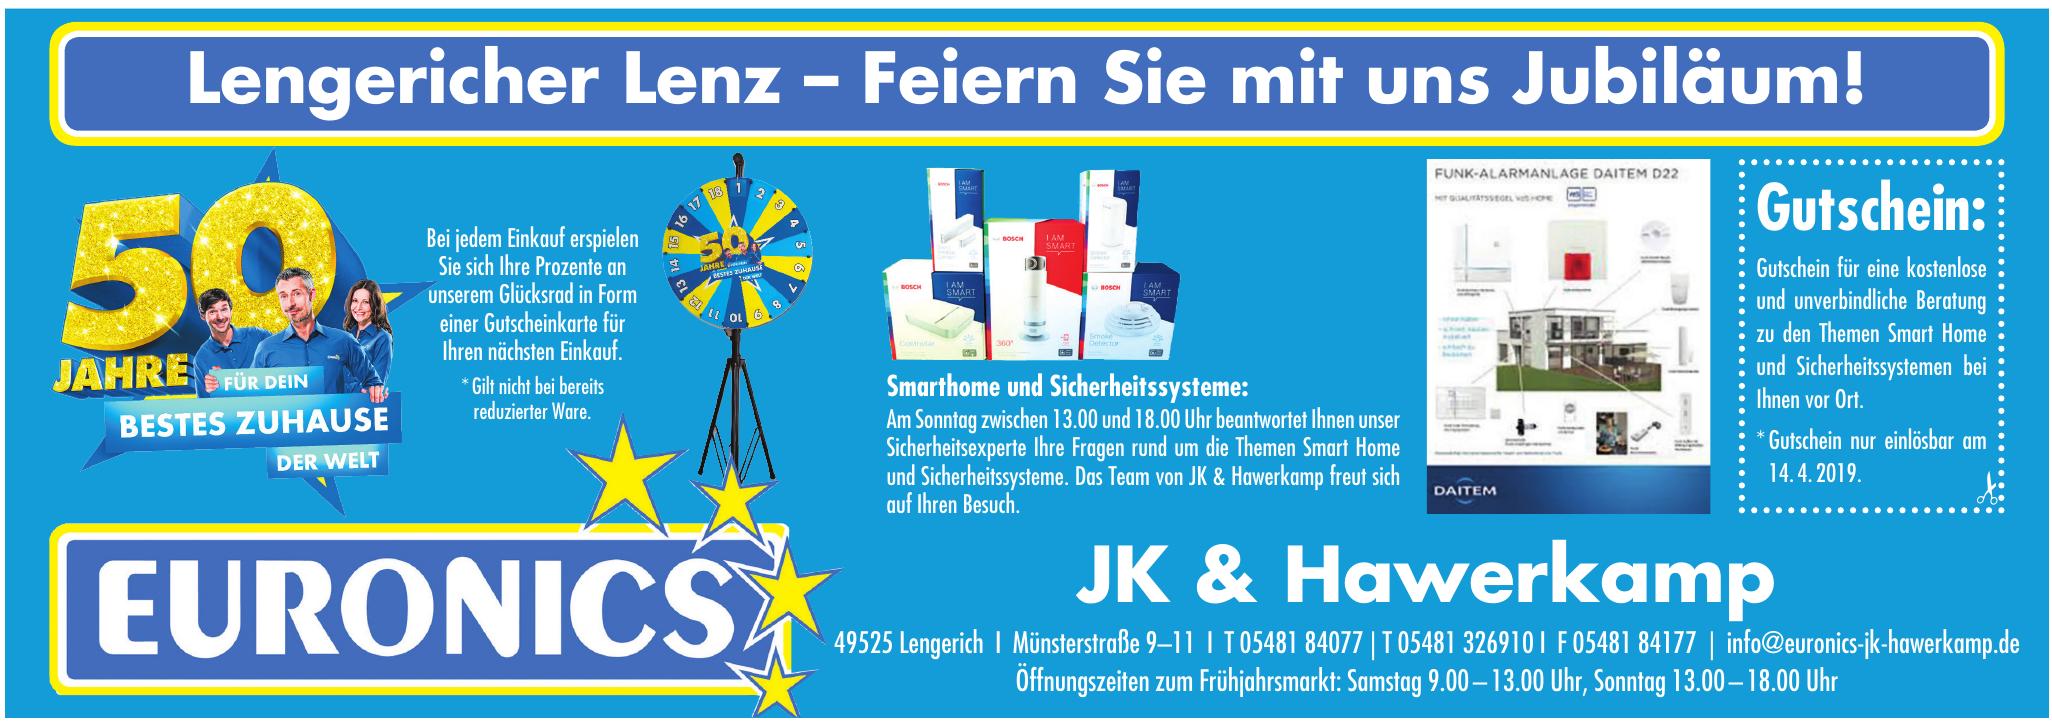 Euronics JK & Hawerkamp